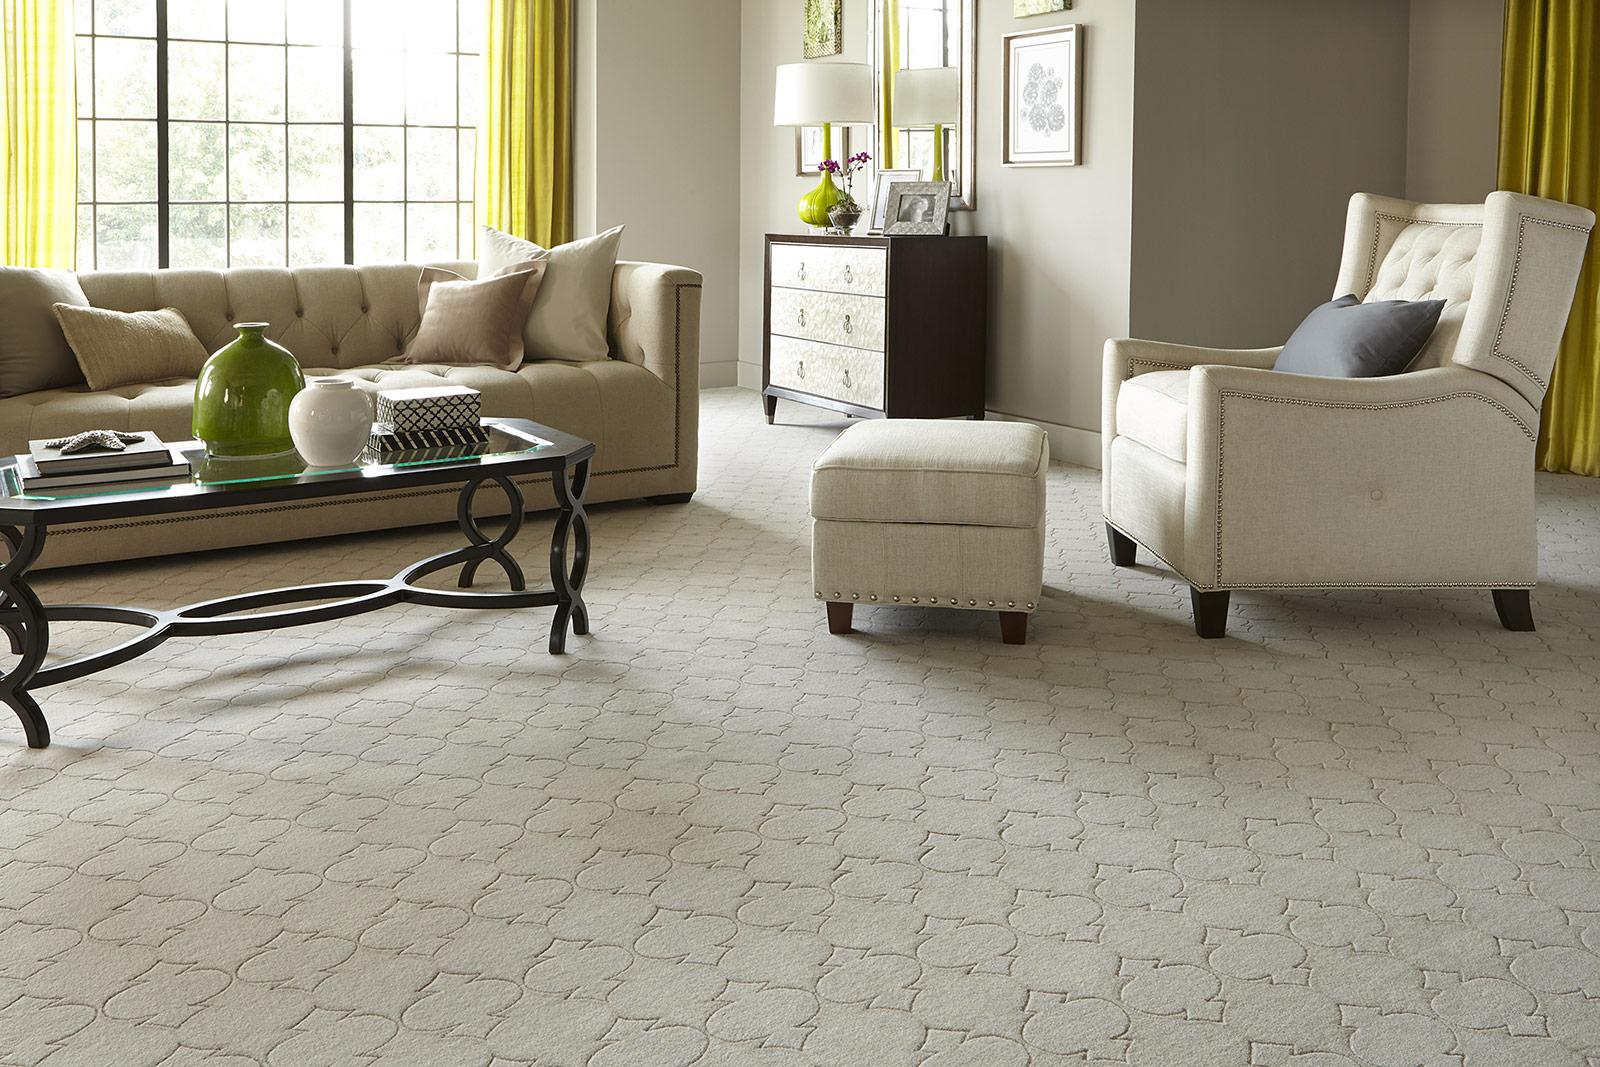 Small apartment ideas  Walltowall carpet